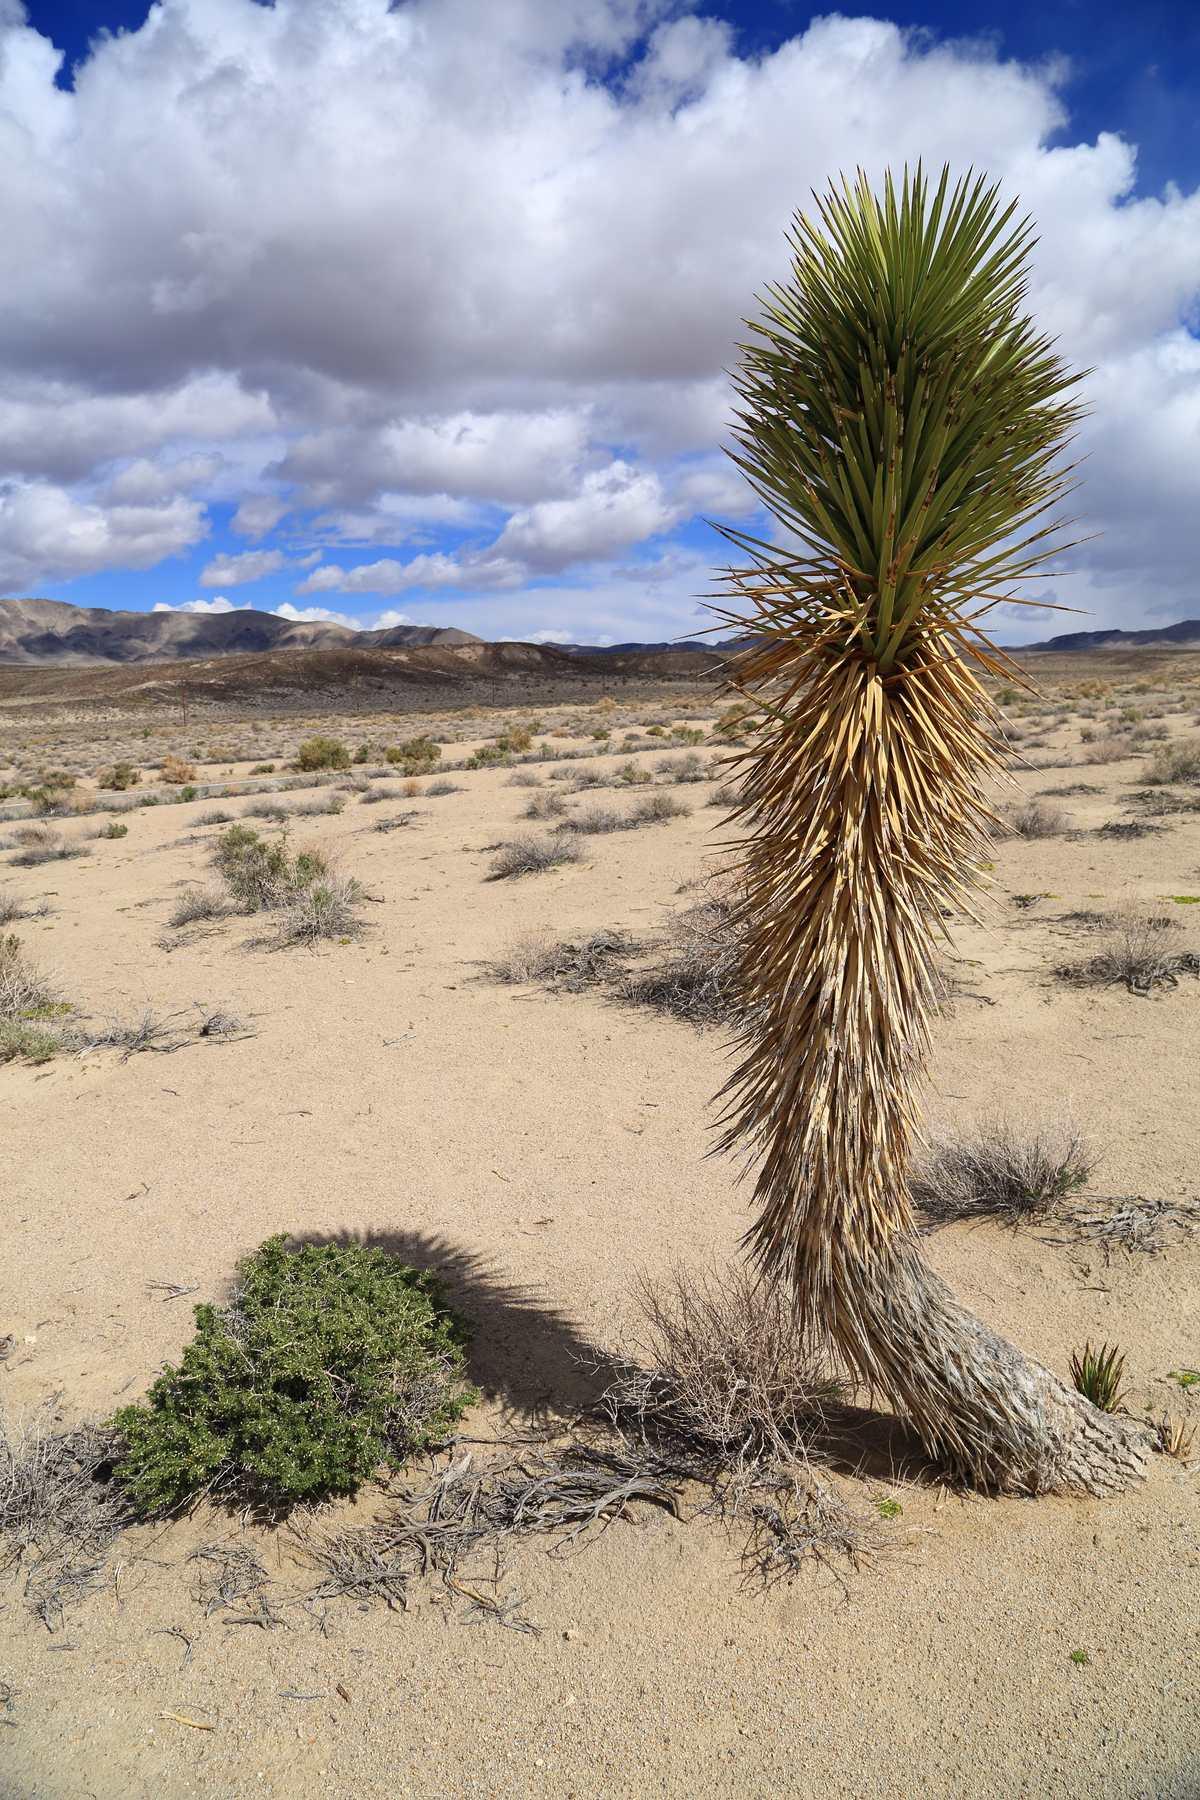 Desert plant on the way